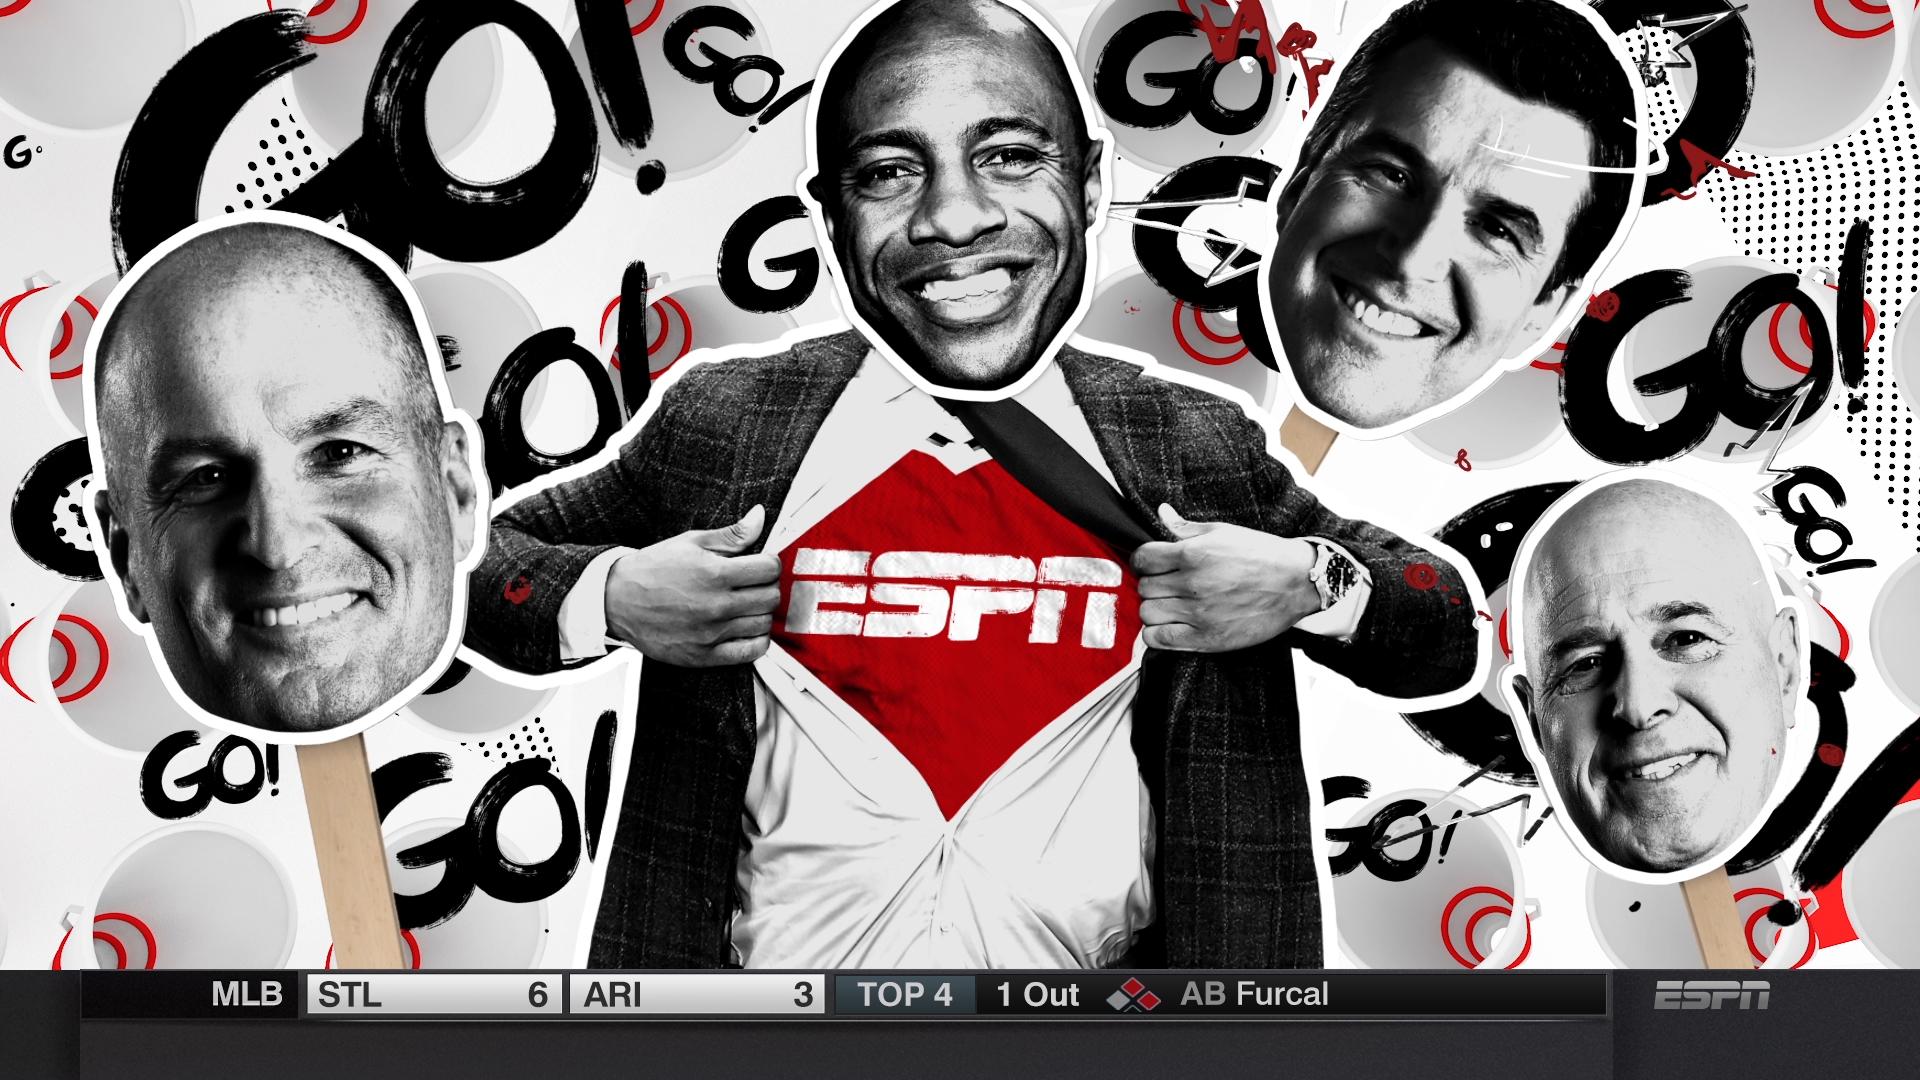 ESPN_CBB_CGD_01_v01.jpg